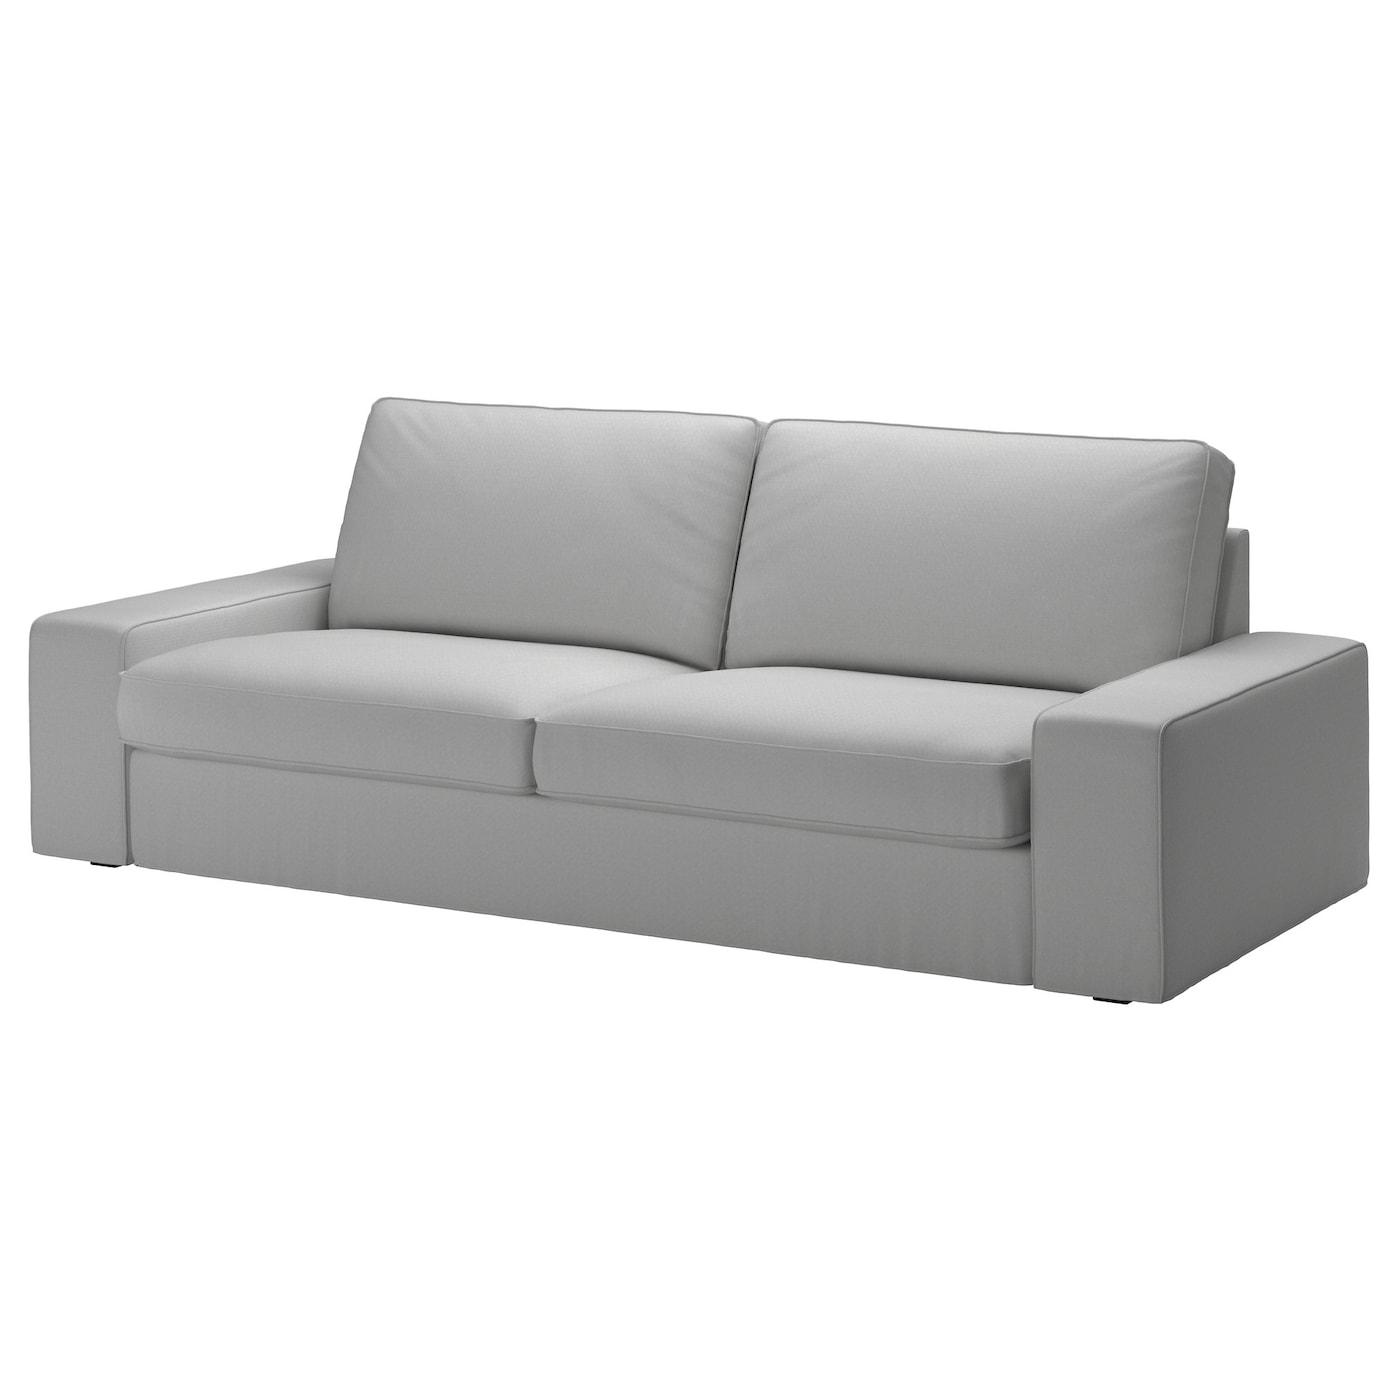 instrucciones montaje sofa kivik ikea